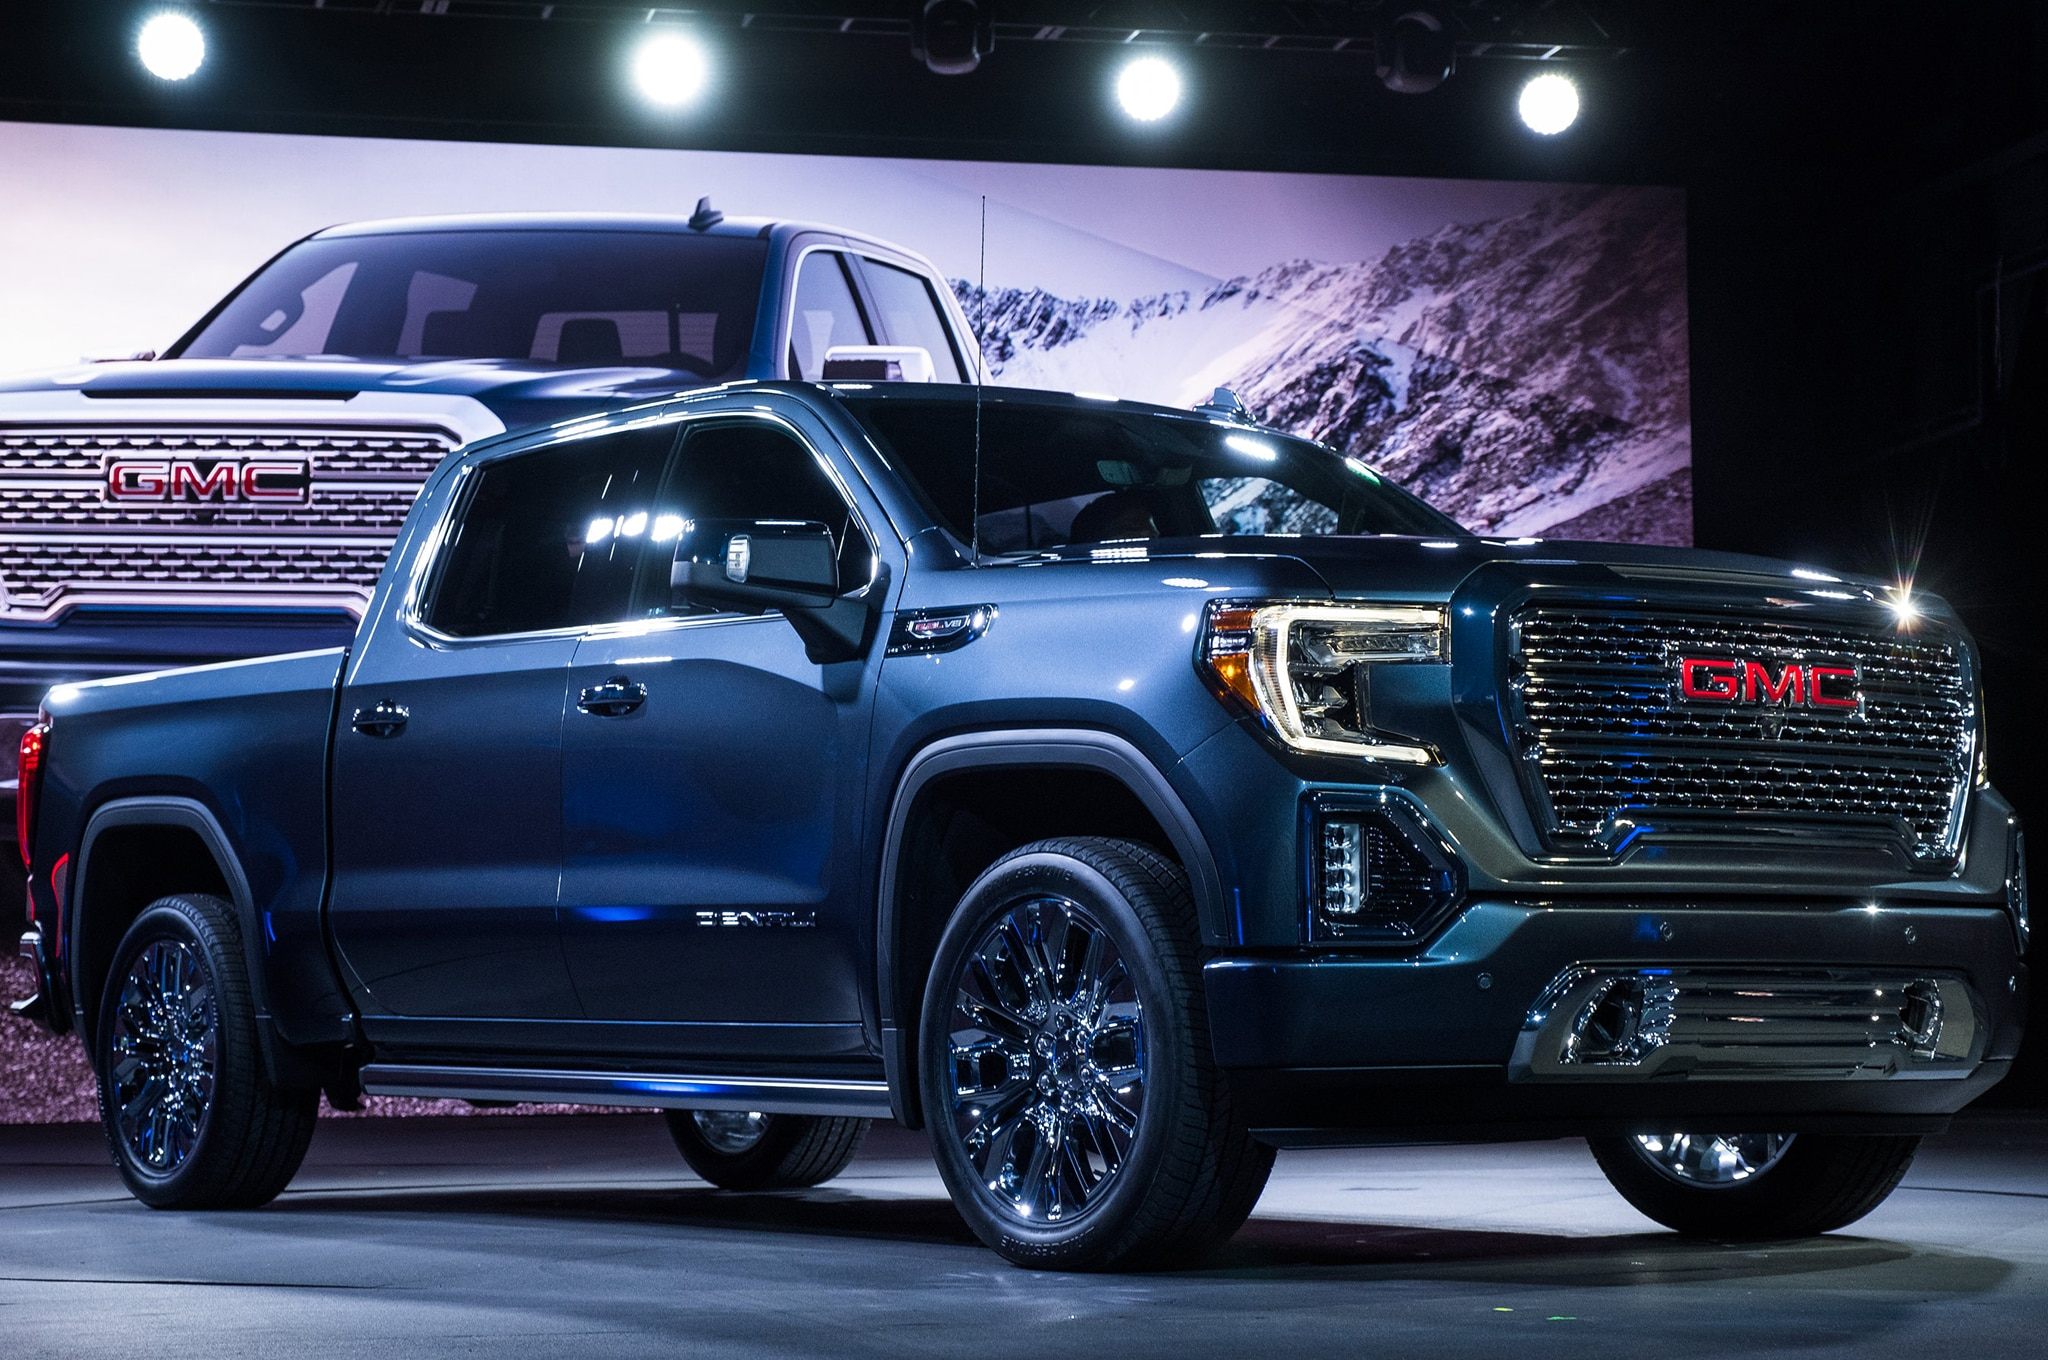 2019 GMC Sierra Denali is Ready for Pick Up | Automobile ...